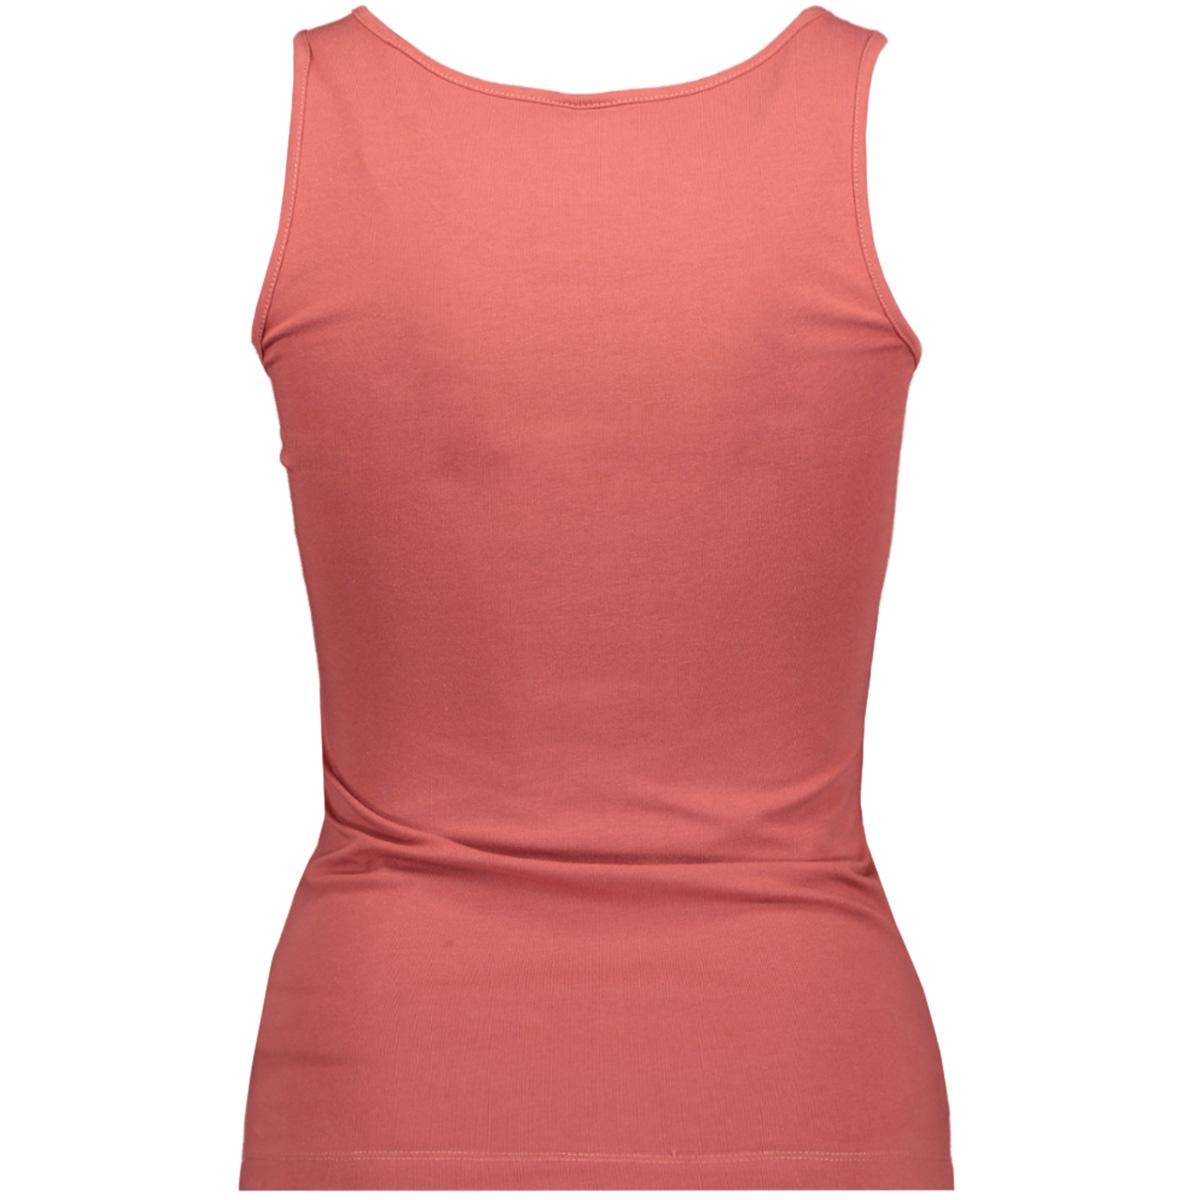 vmmaxi my soft short tank top ga color 10228808 vero moda top marsala